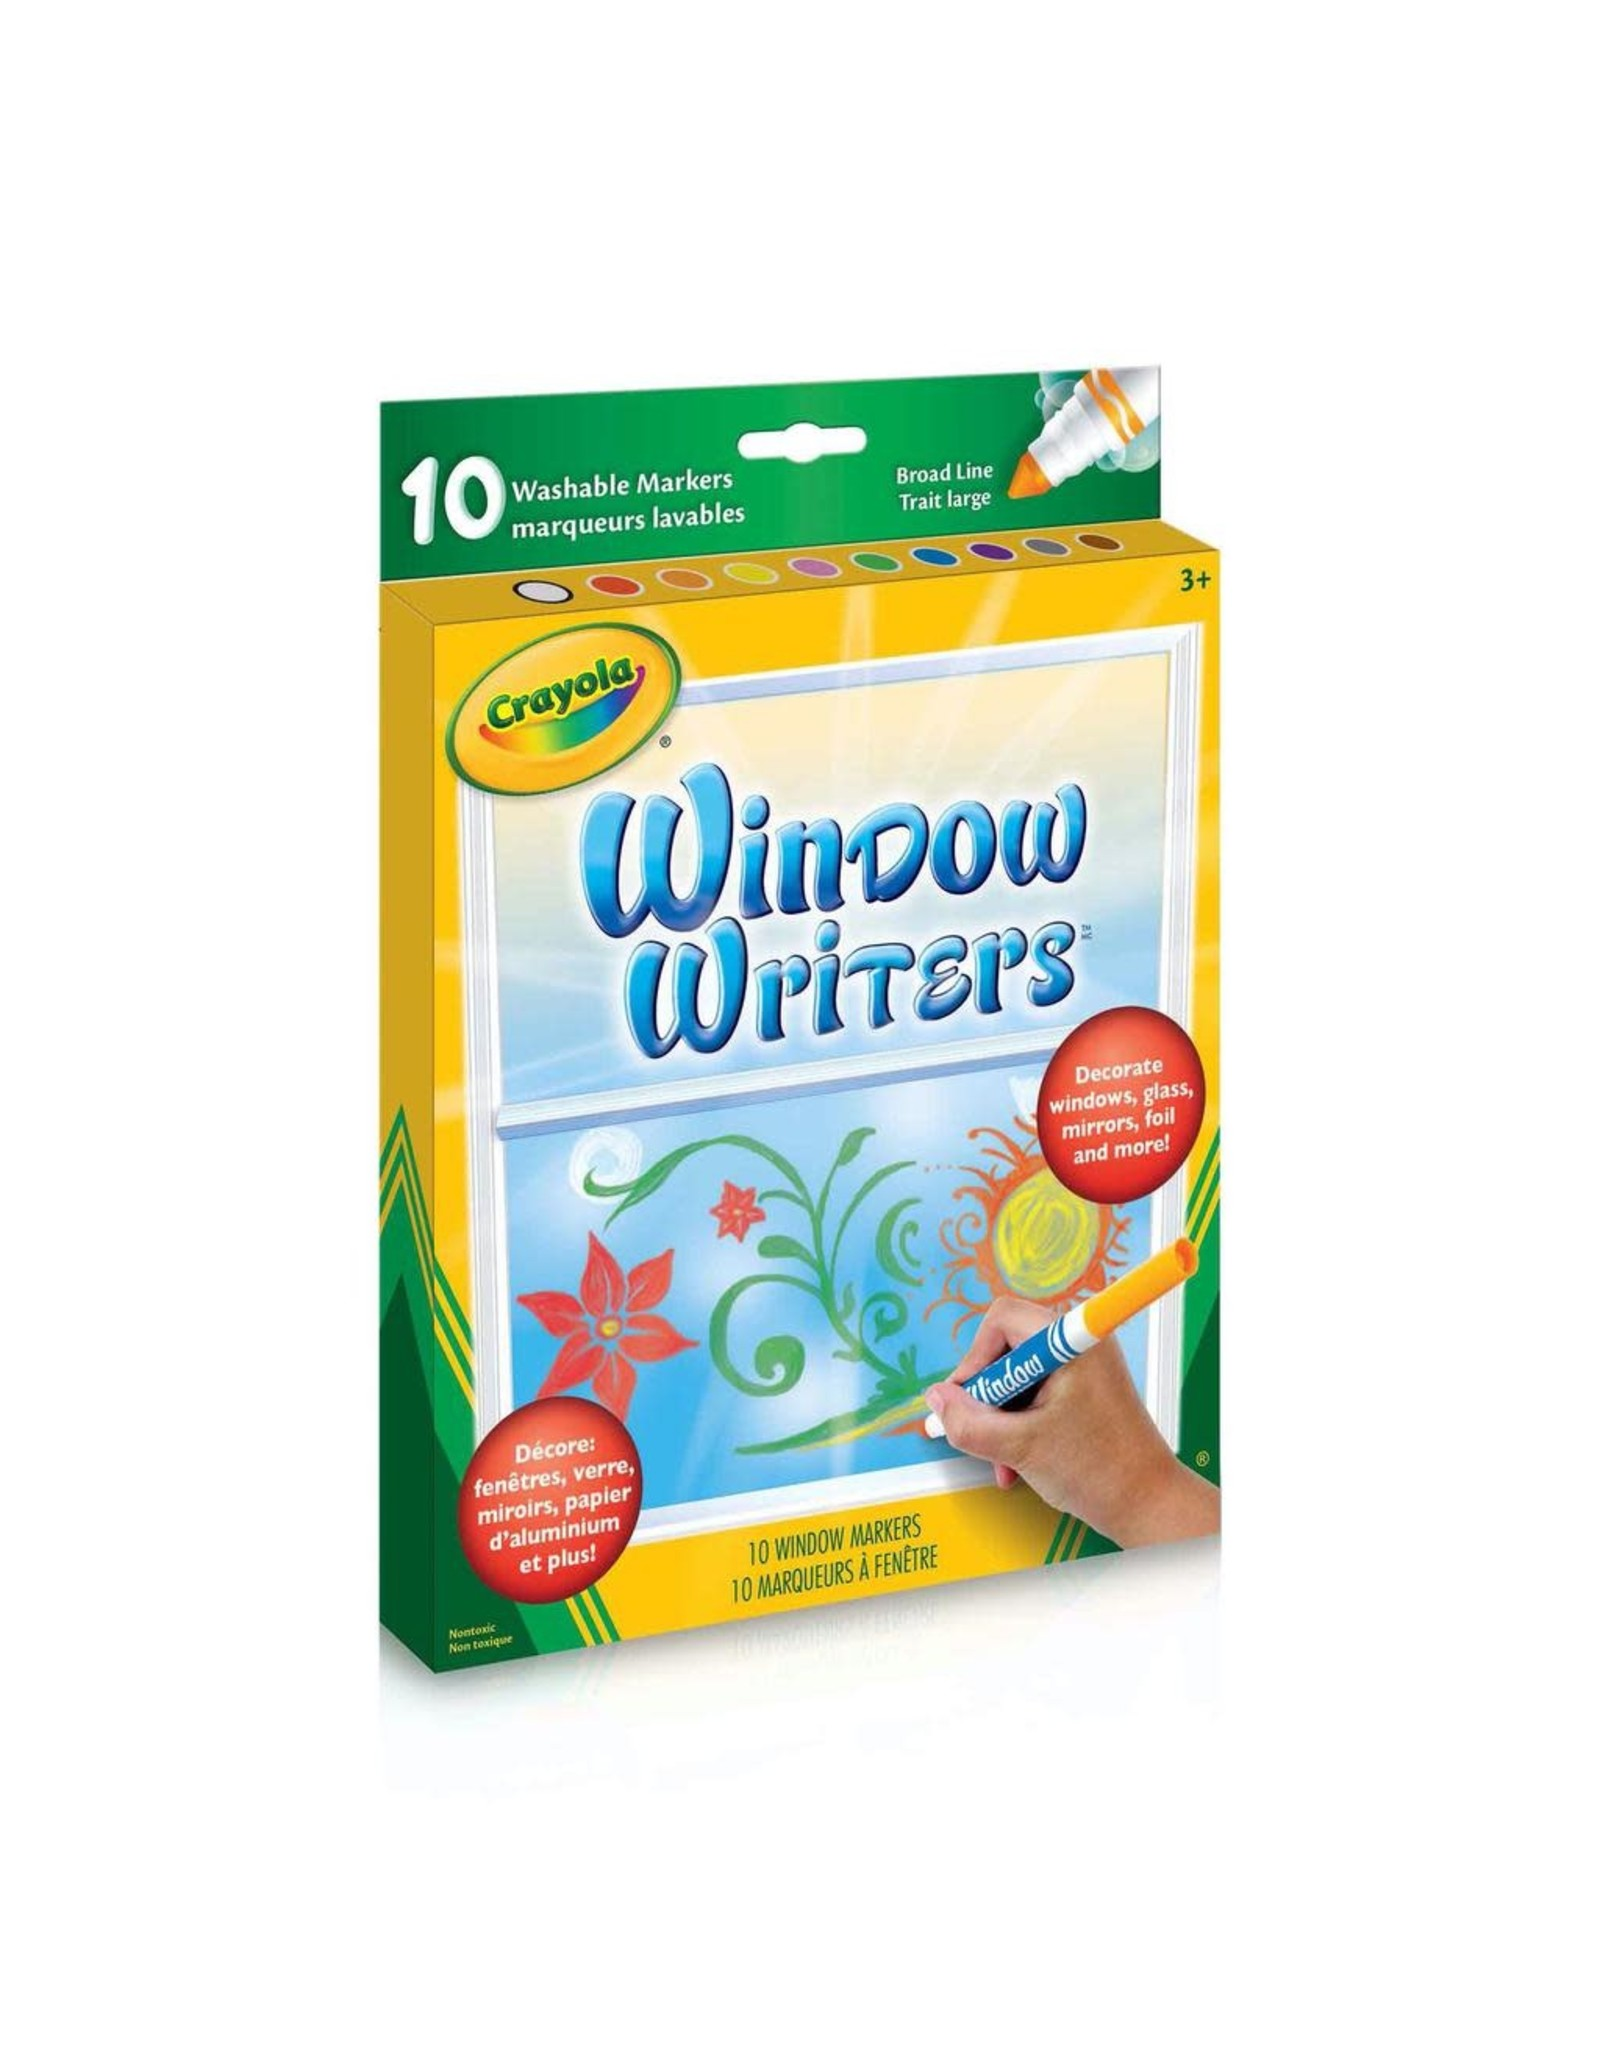 Crayola 10 Window Writers Washable